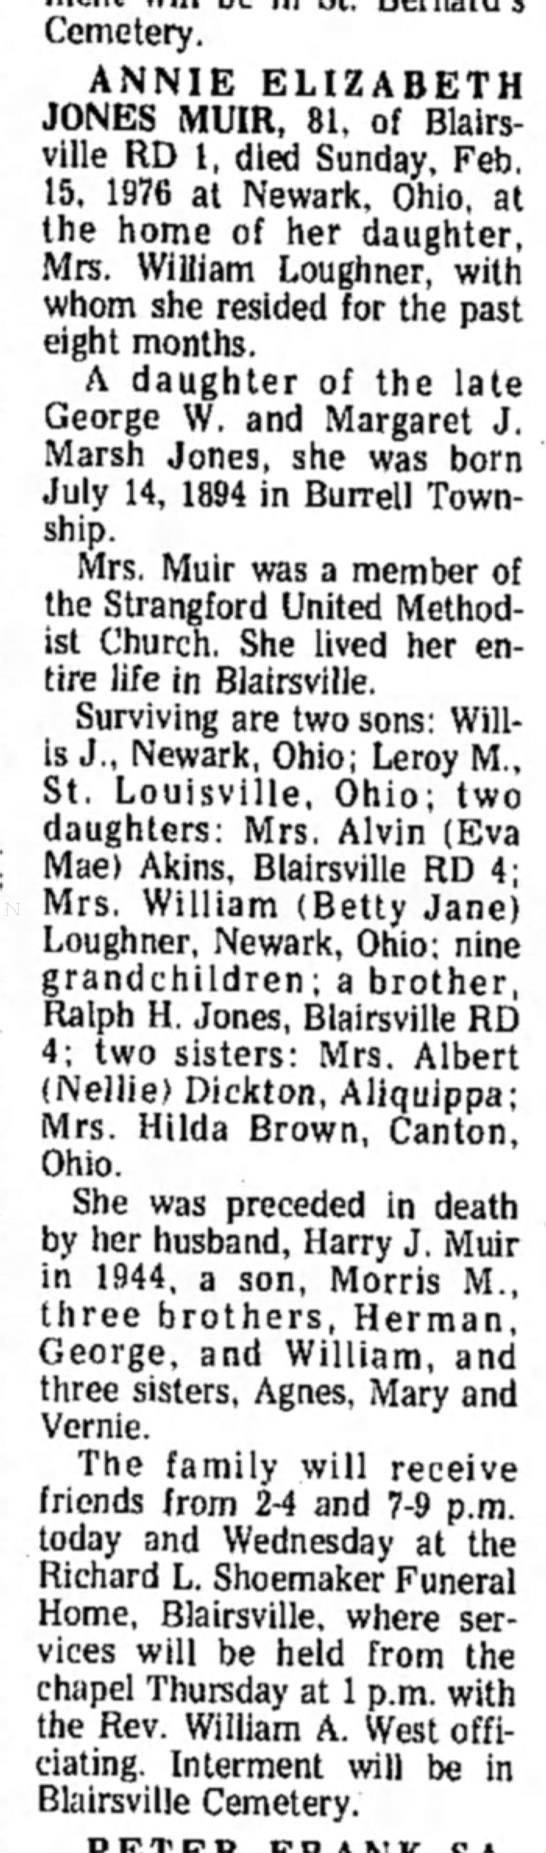 Jones Annie Elizabeth Obit Feb 17, 1976 - Cemetery. ANNIE ELIZABETH JONES MUIR, 81, of...